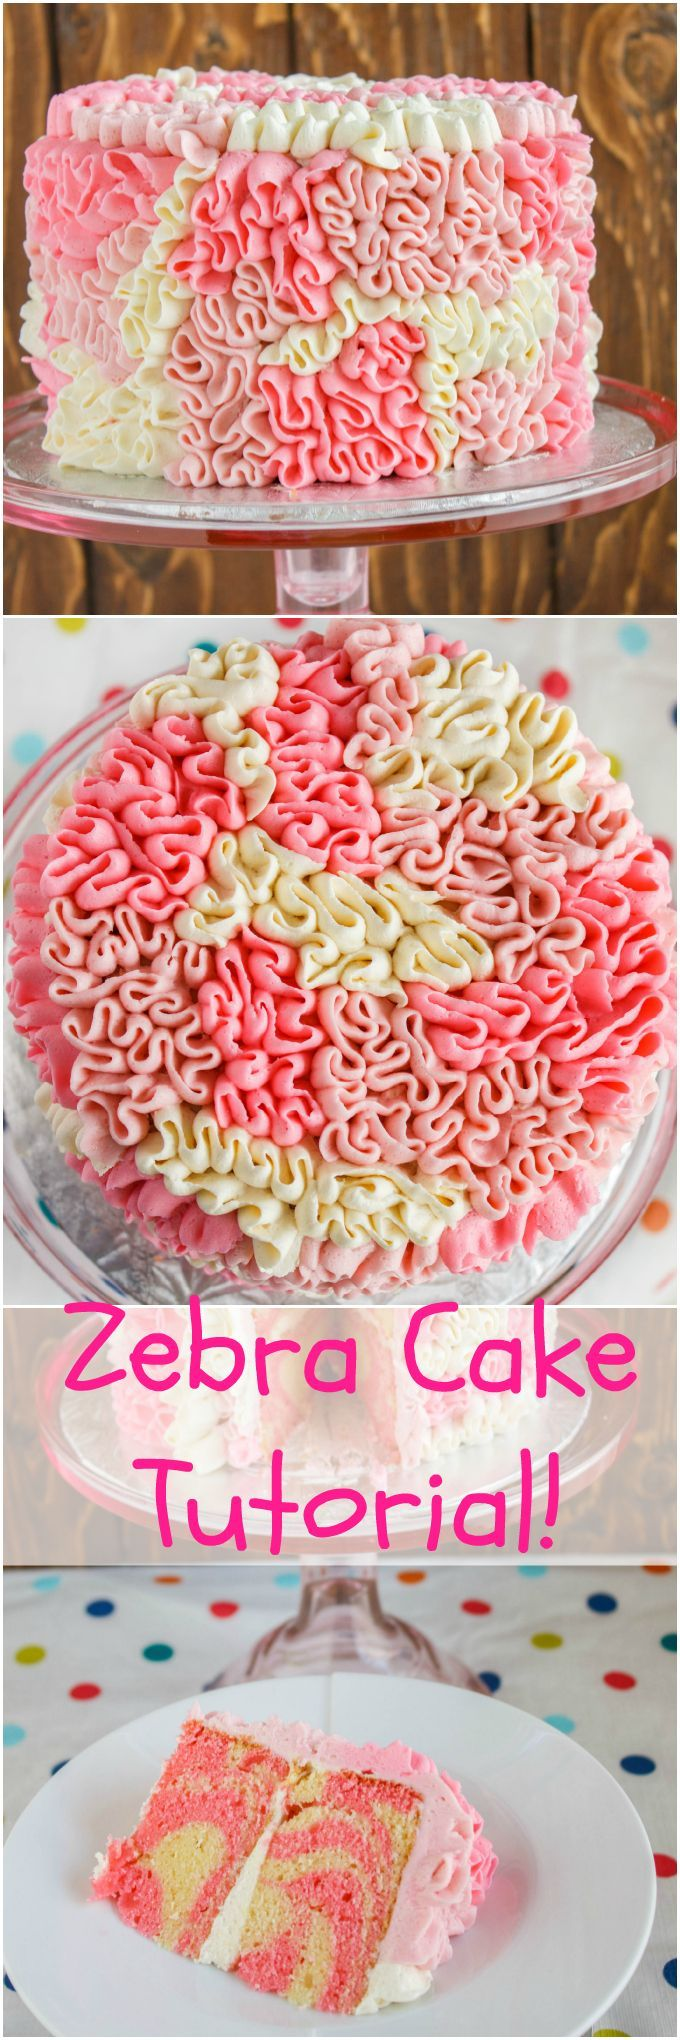 Zebra Cake with Messy Ruffles   #cake #dessert #pink   thecookiewriter.com